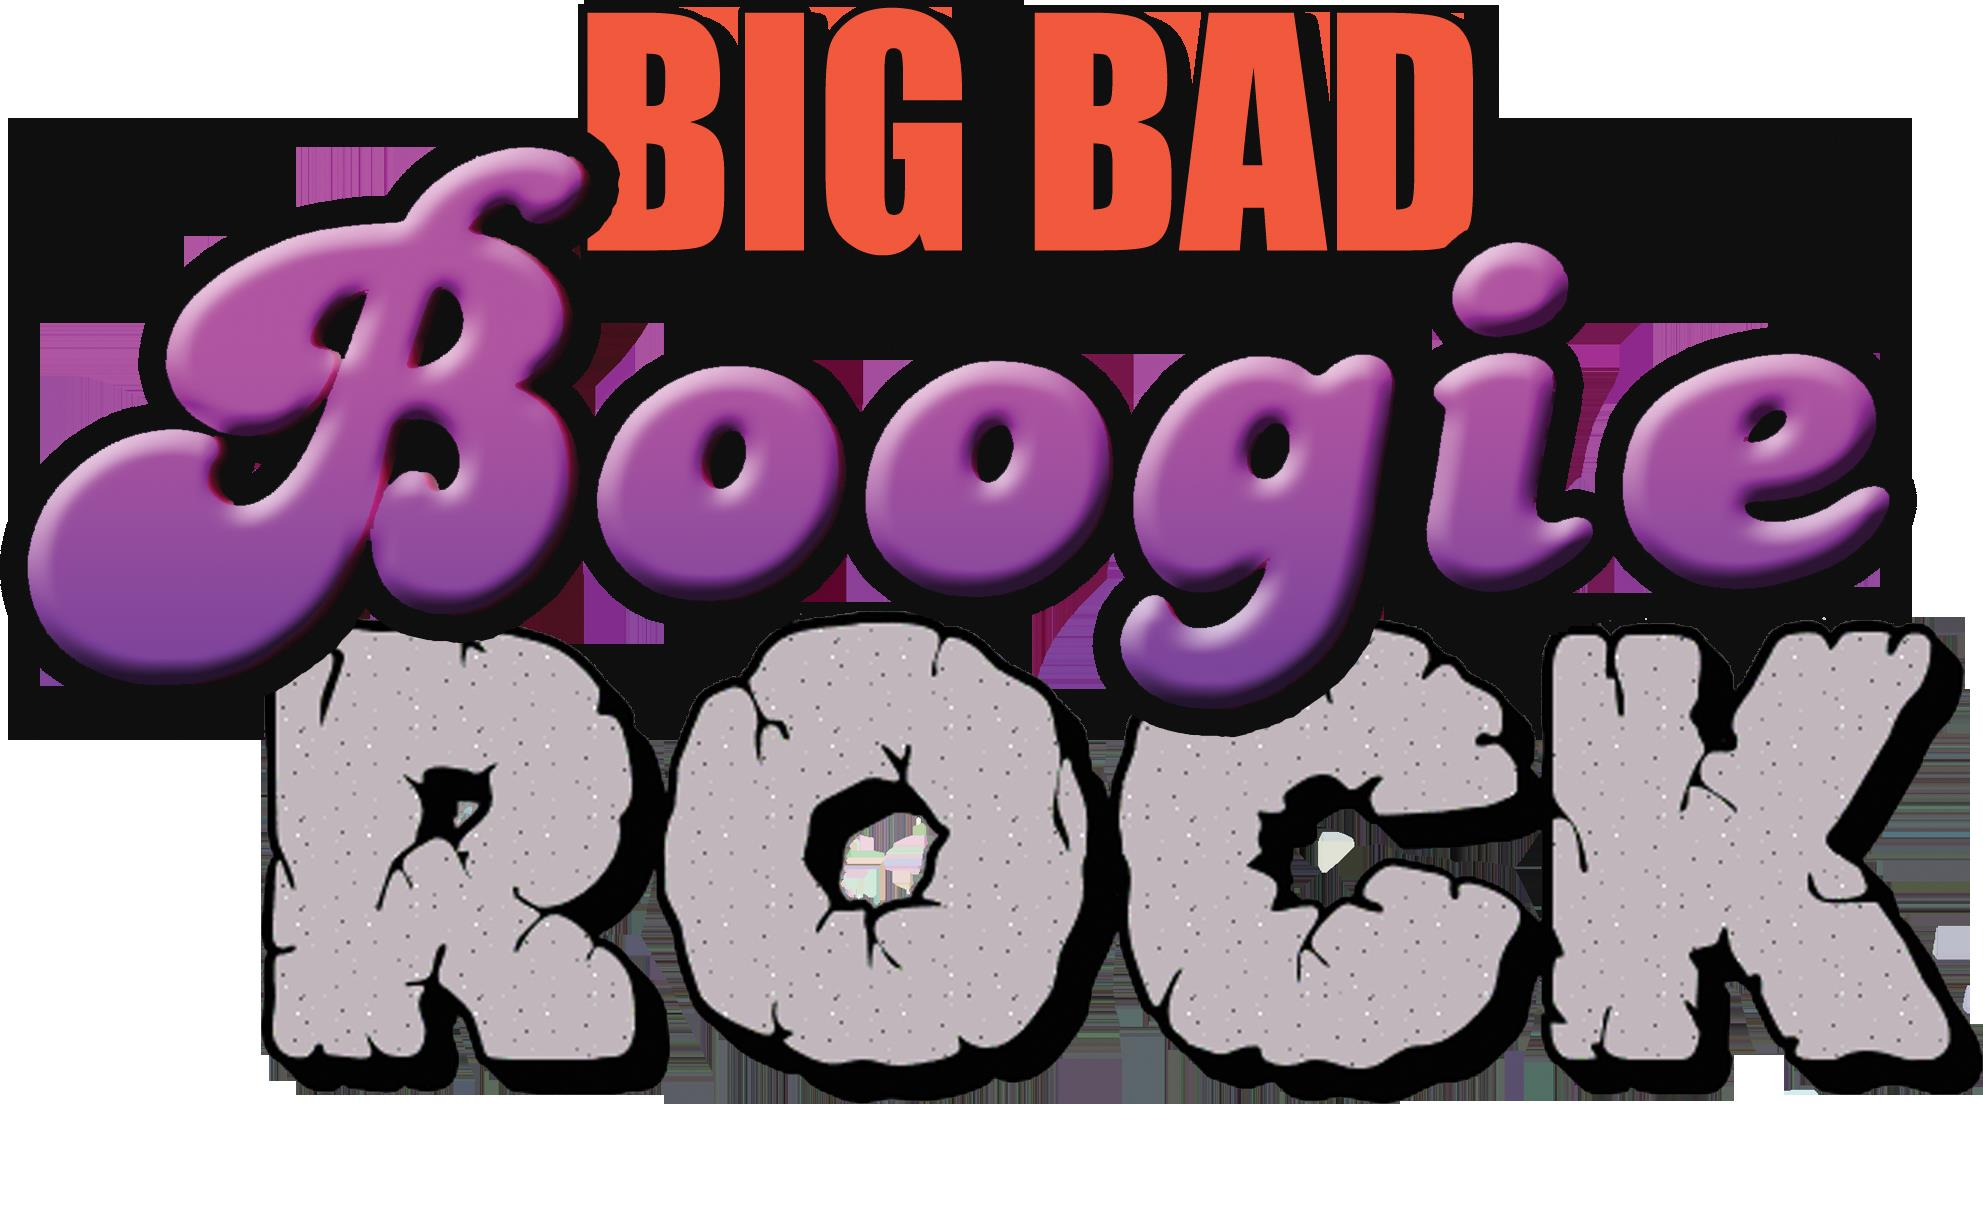 Big bad boogie logo.jpg